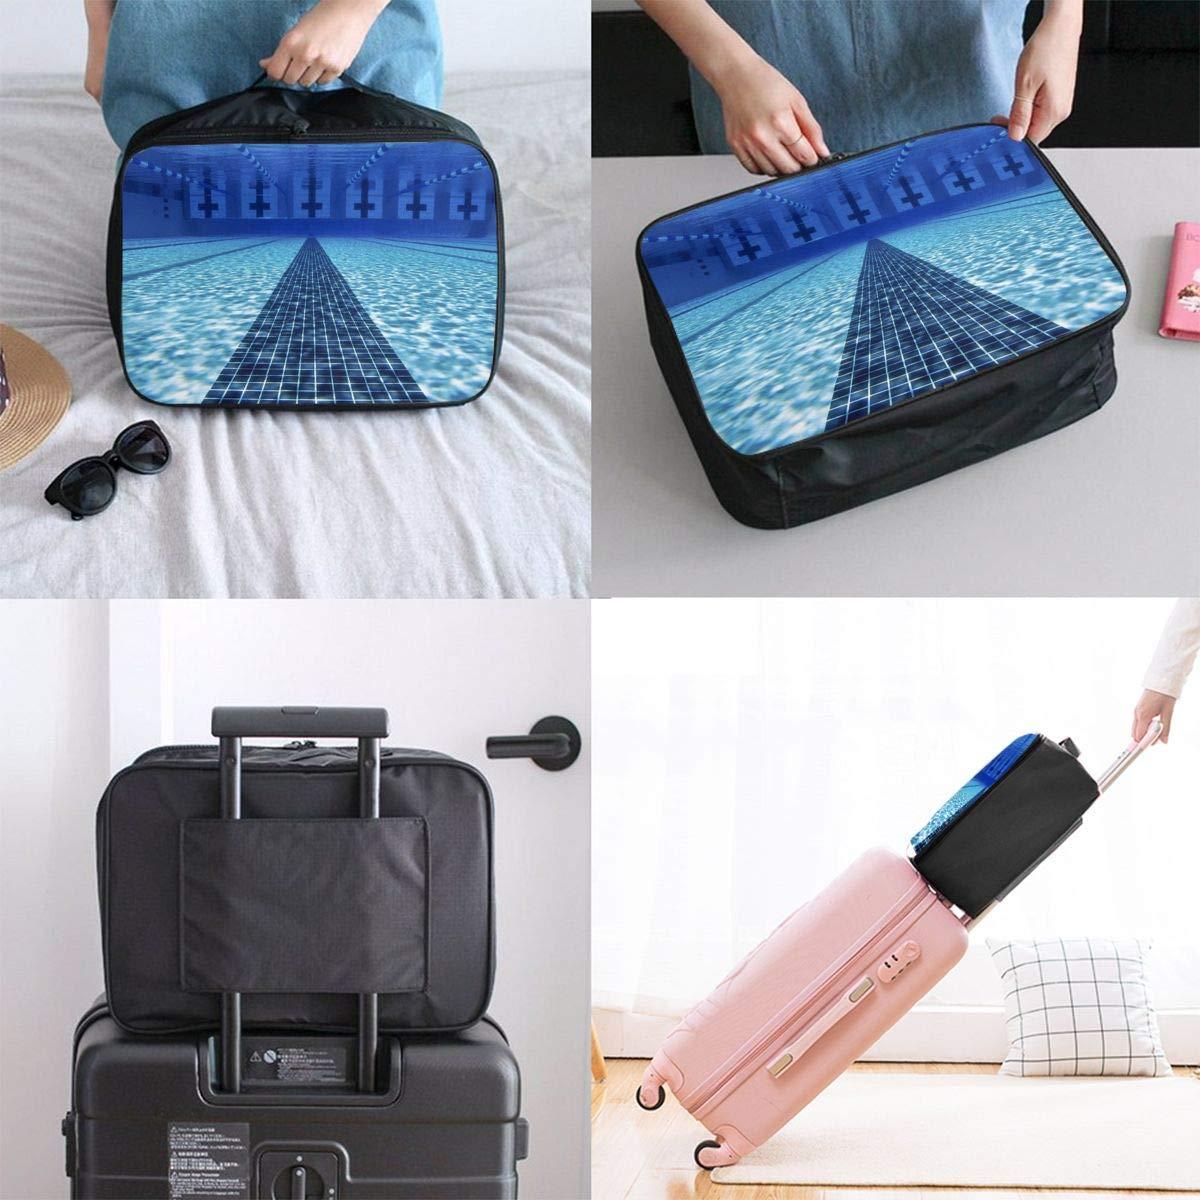 JTRVW Luggage Bags for Travel Lightweight Large Capacity Portable Duffel Bag for Men /& Women Swimming Pool Travel Duffel Bag Backpack